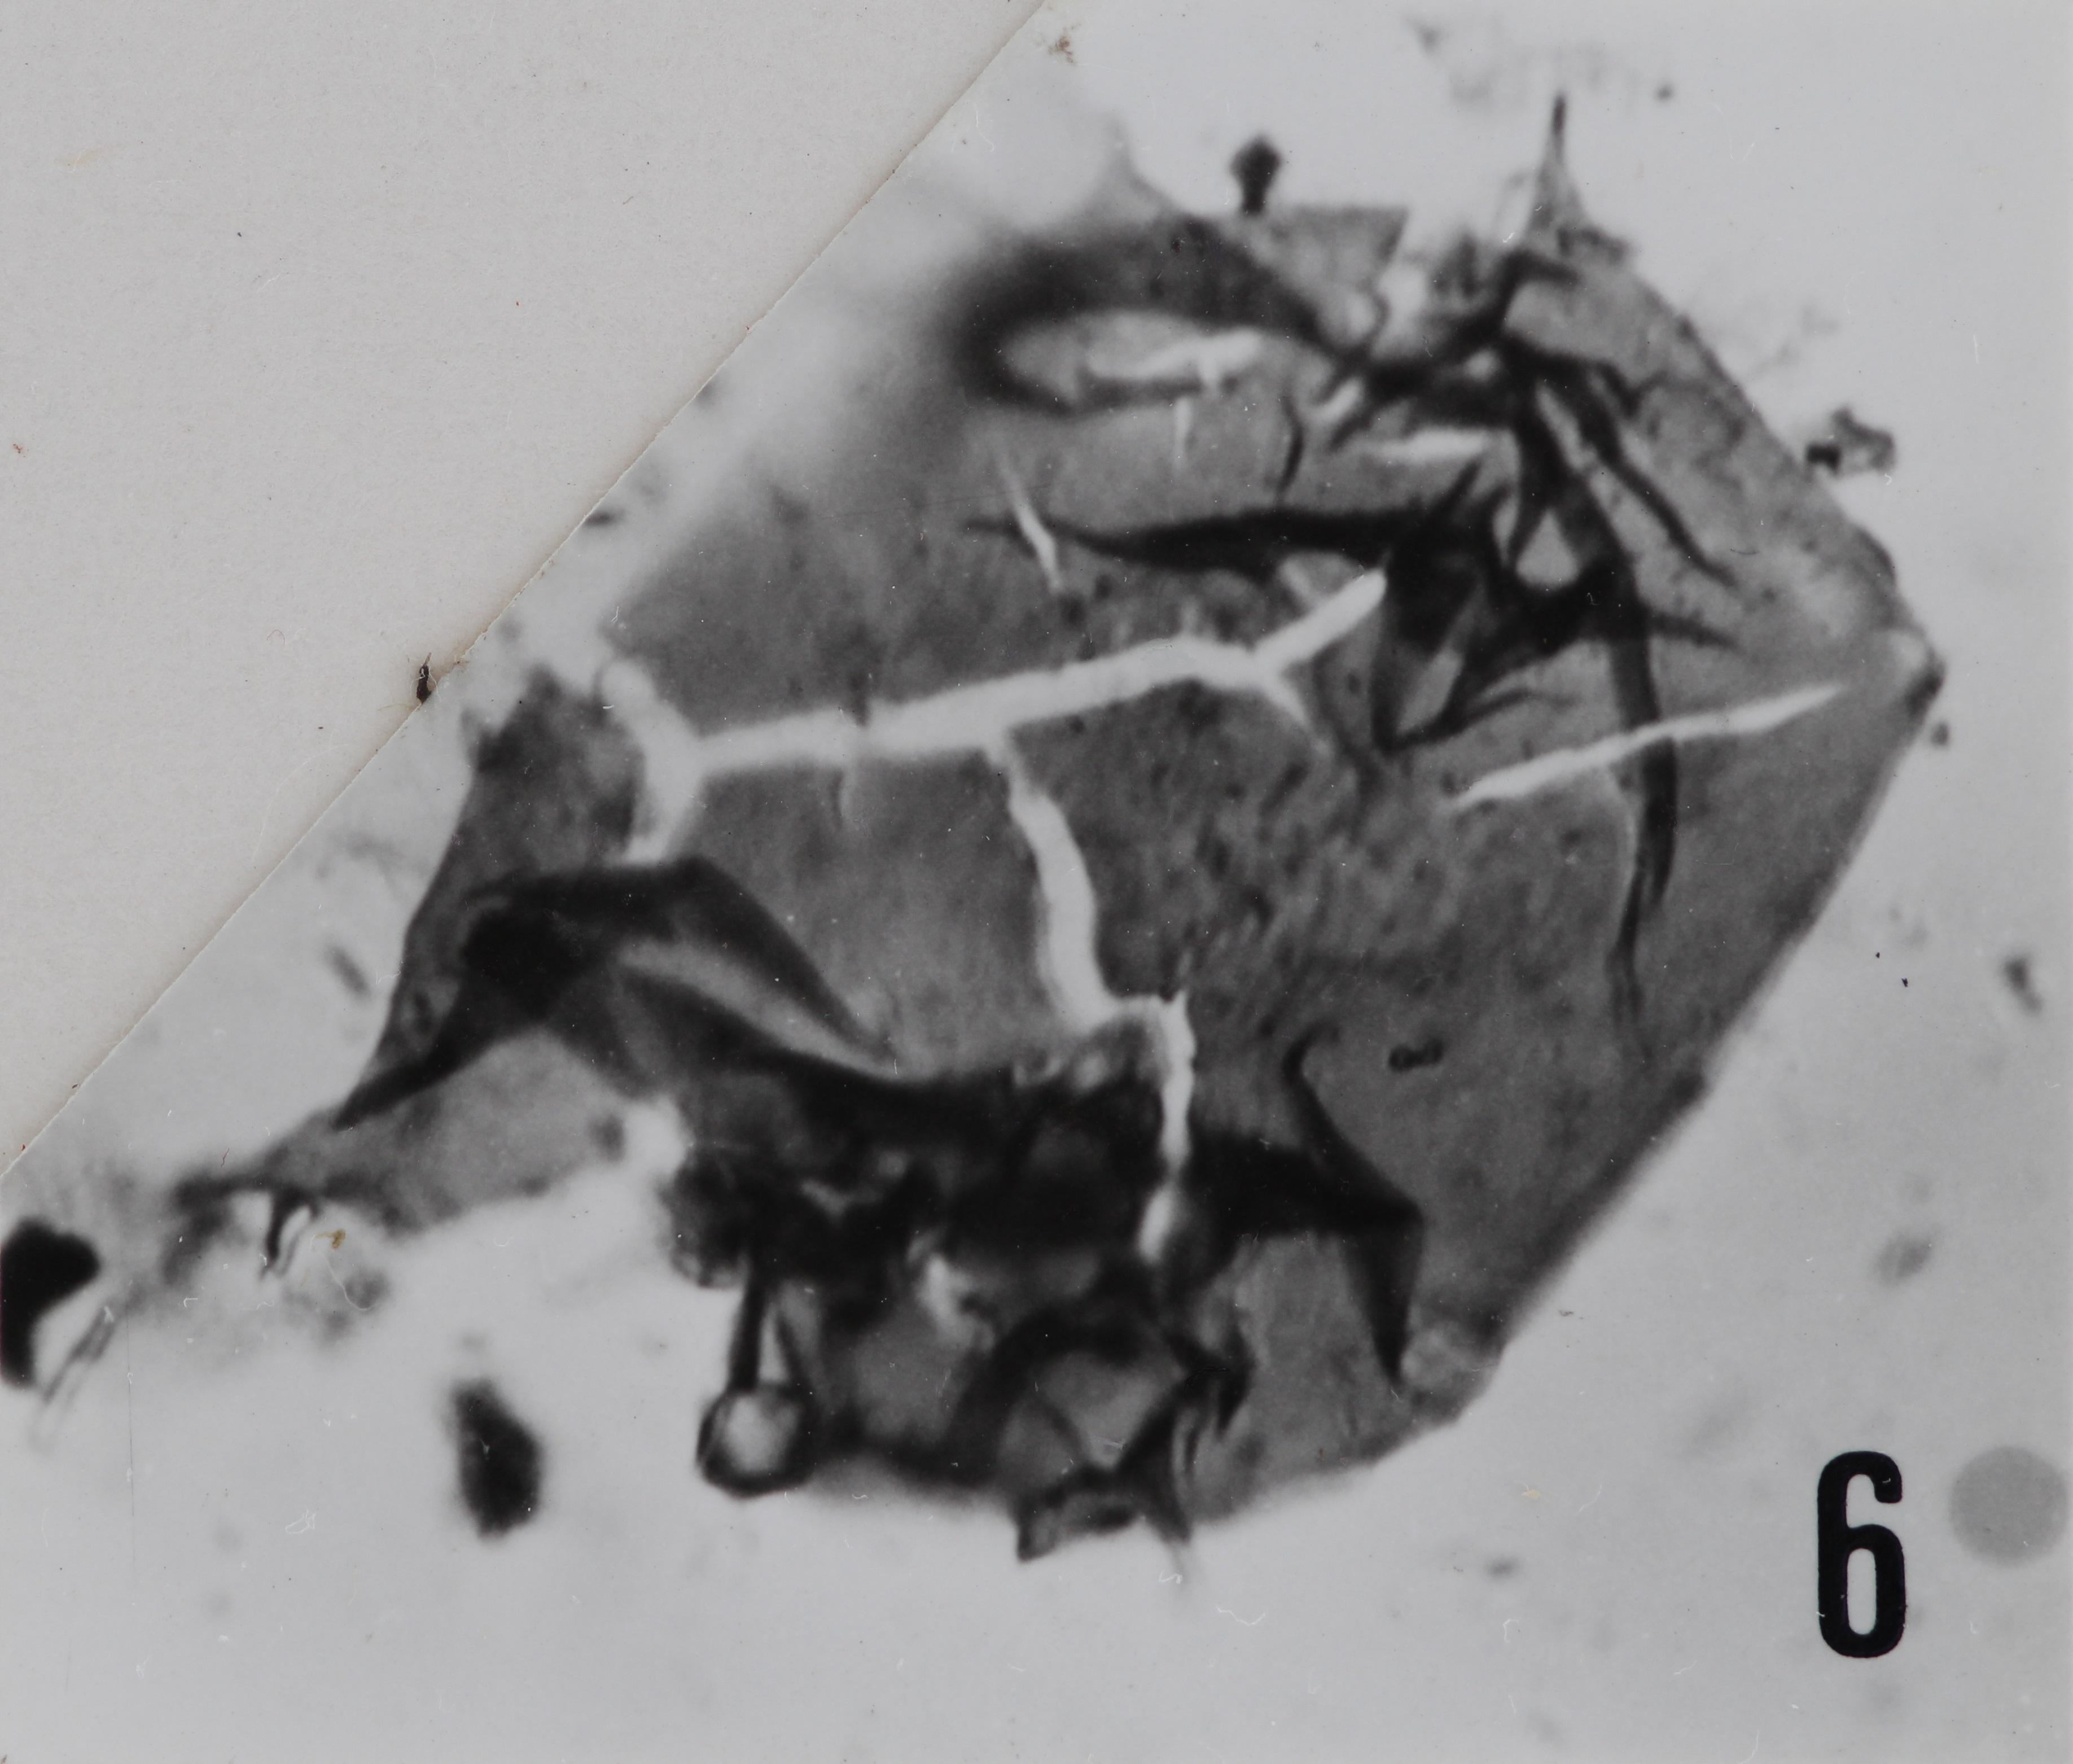 Fig. 6 - Acanthodiacrodium aff. micronatum Timofeev, B., 1959. Sainte-Cécile : STC-2. b 459.